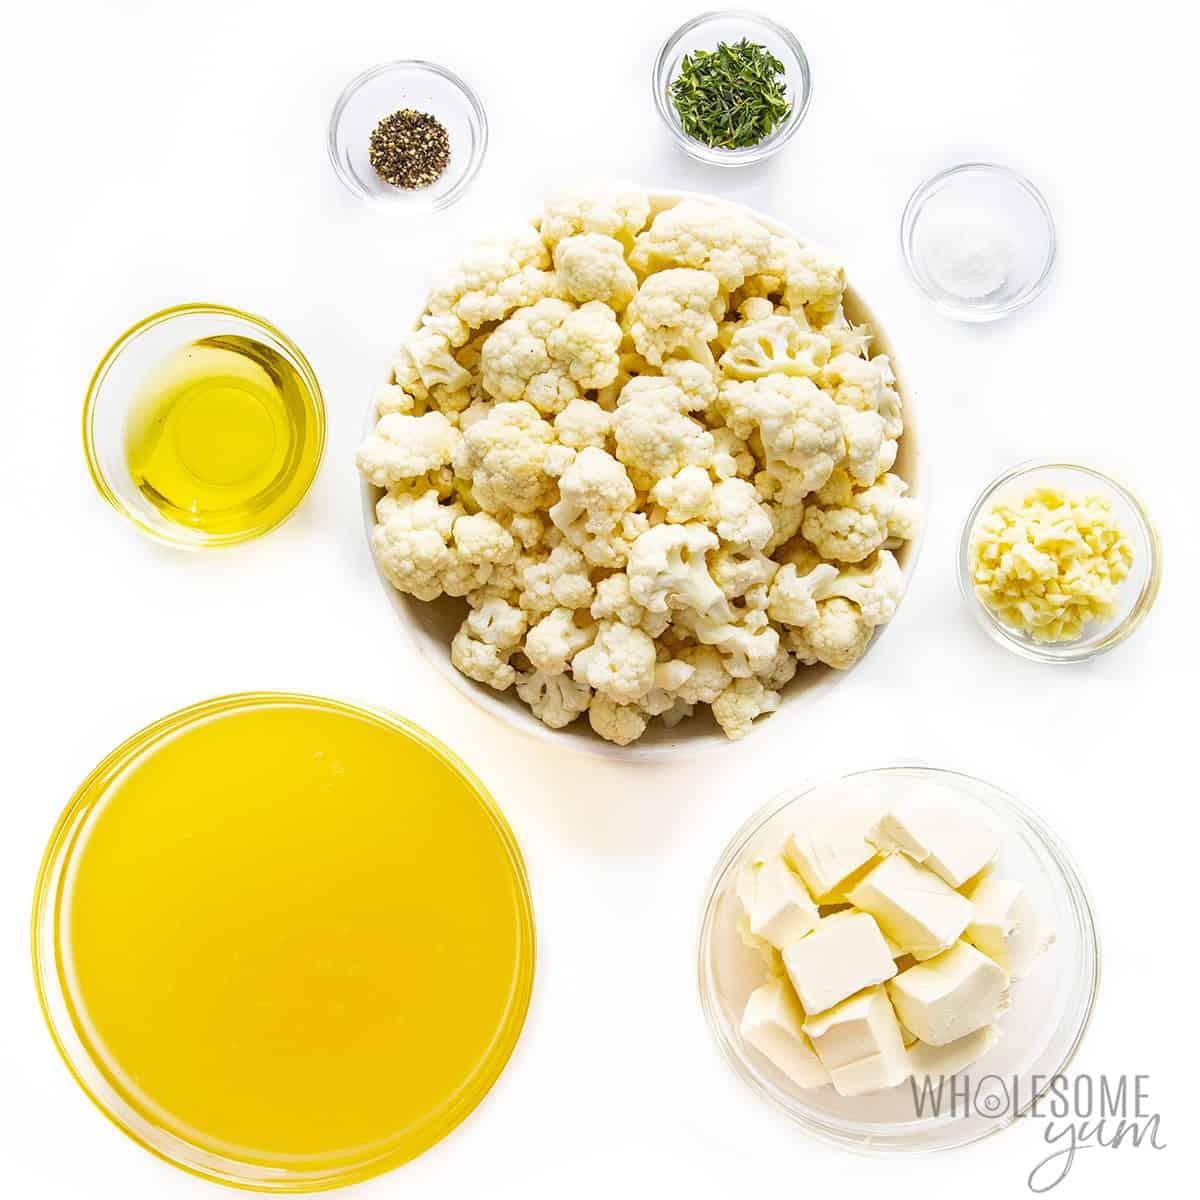 Roasted cauliflower soup ingredients